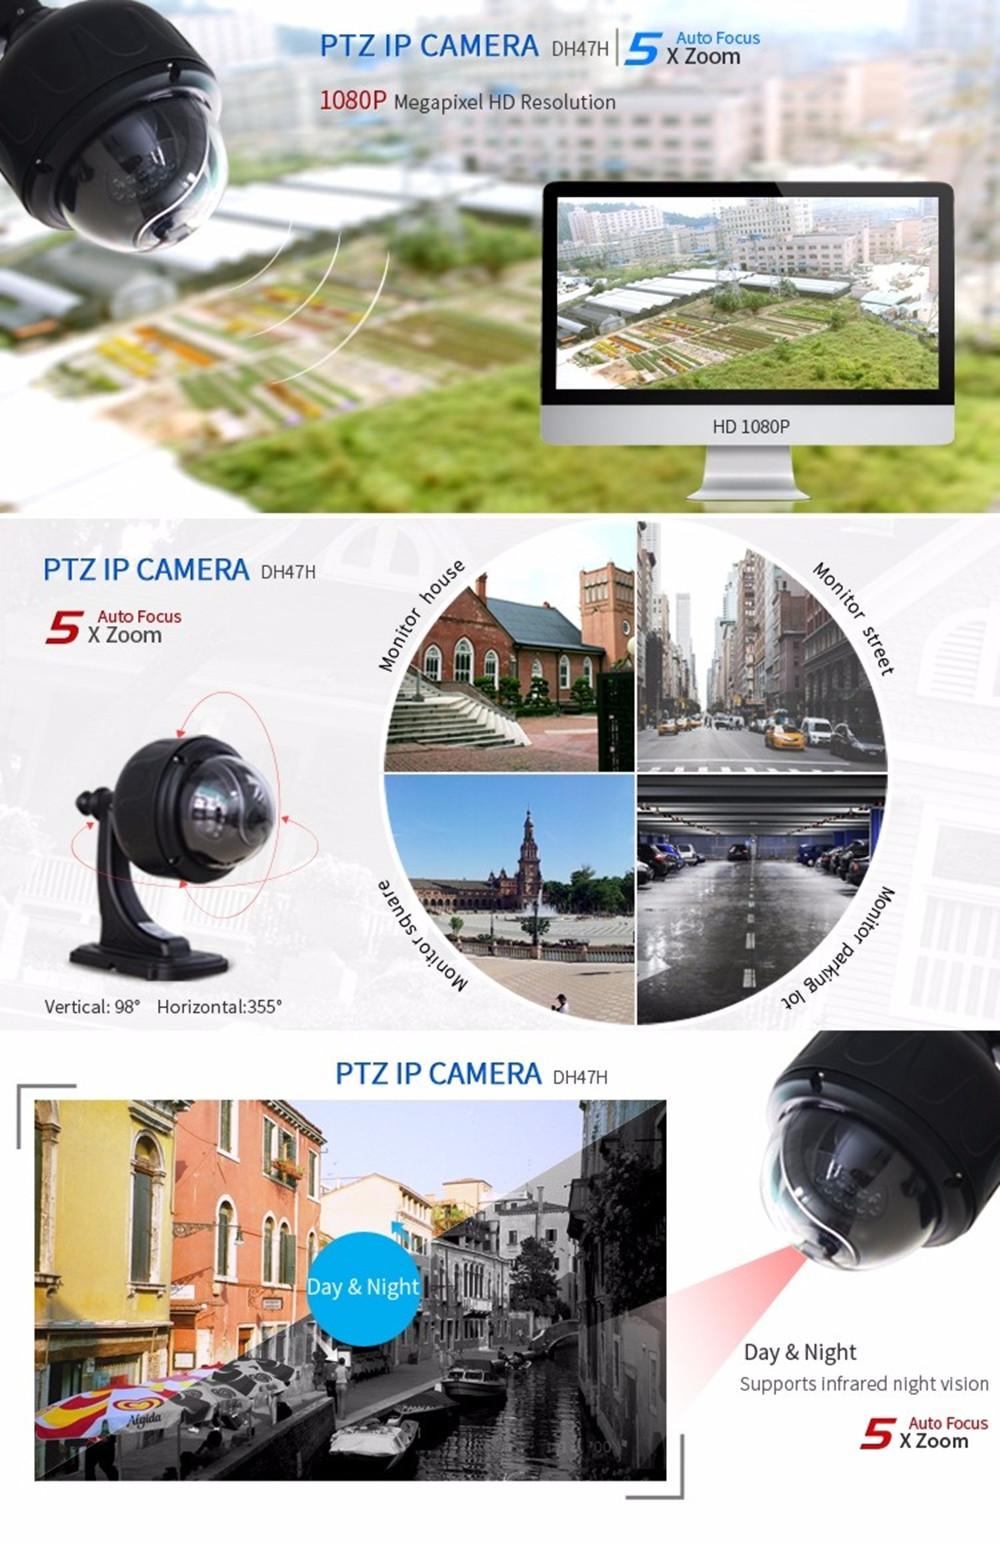 ZILNK 1080P HD PTZ Speed Dome Camera DH47H Black details (1)